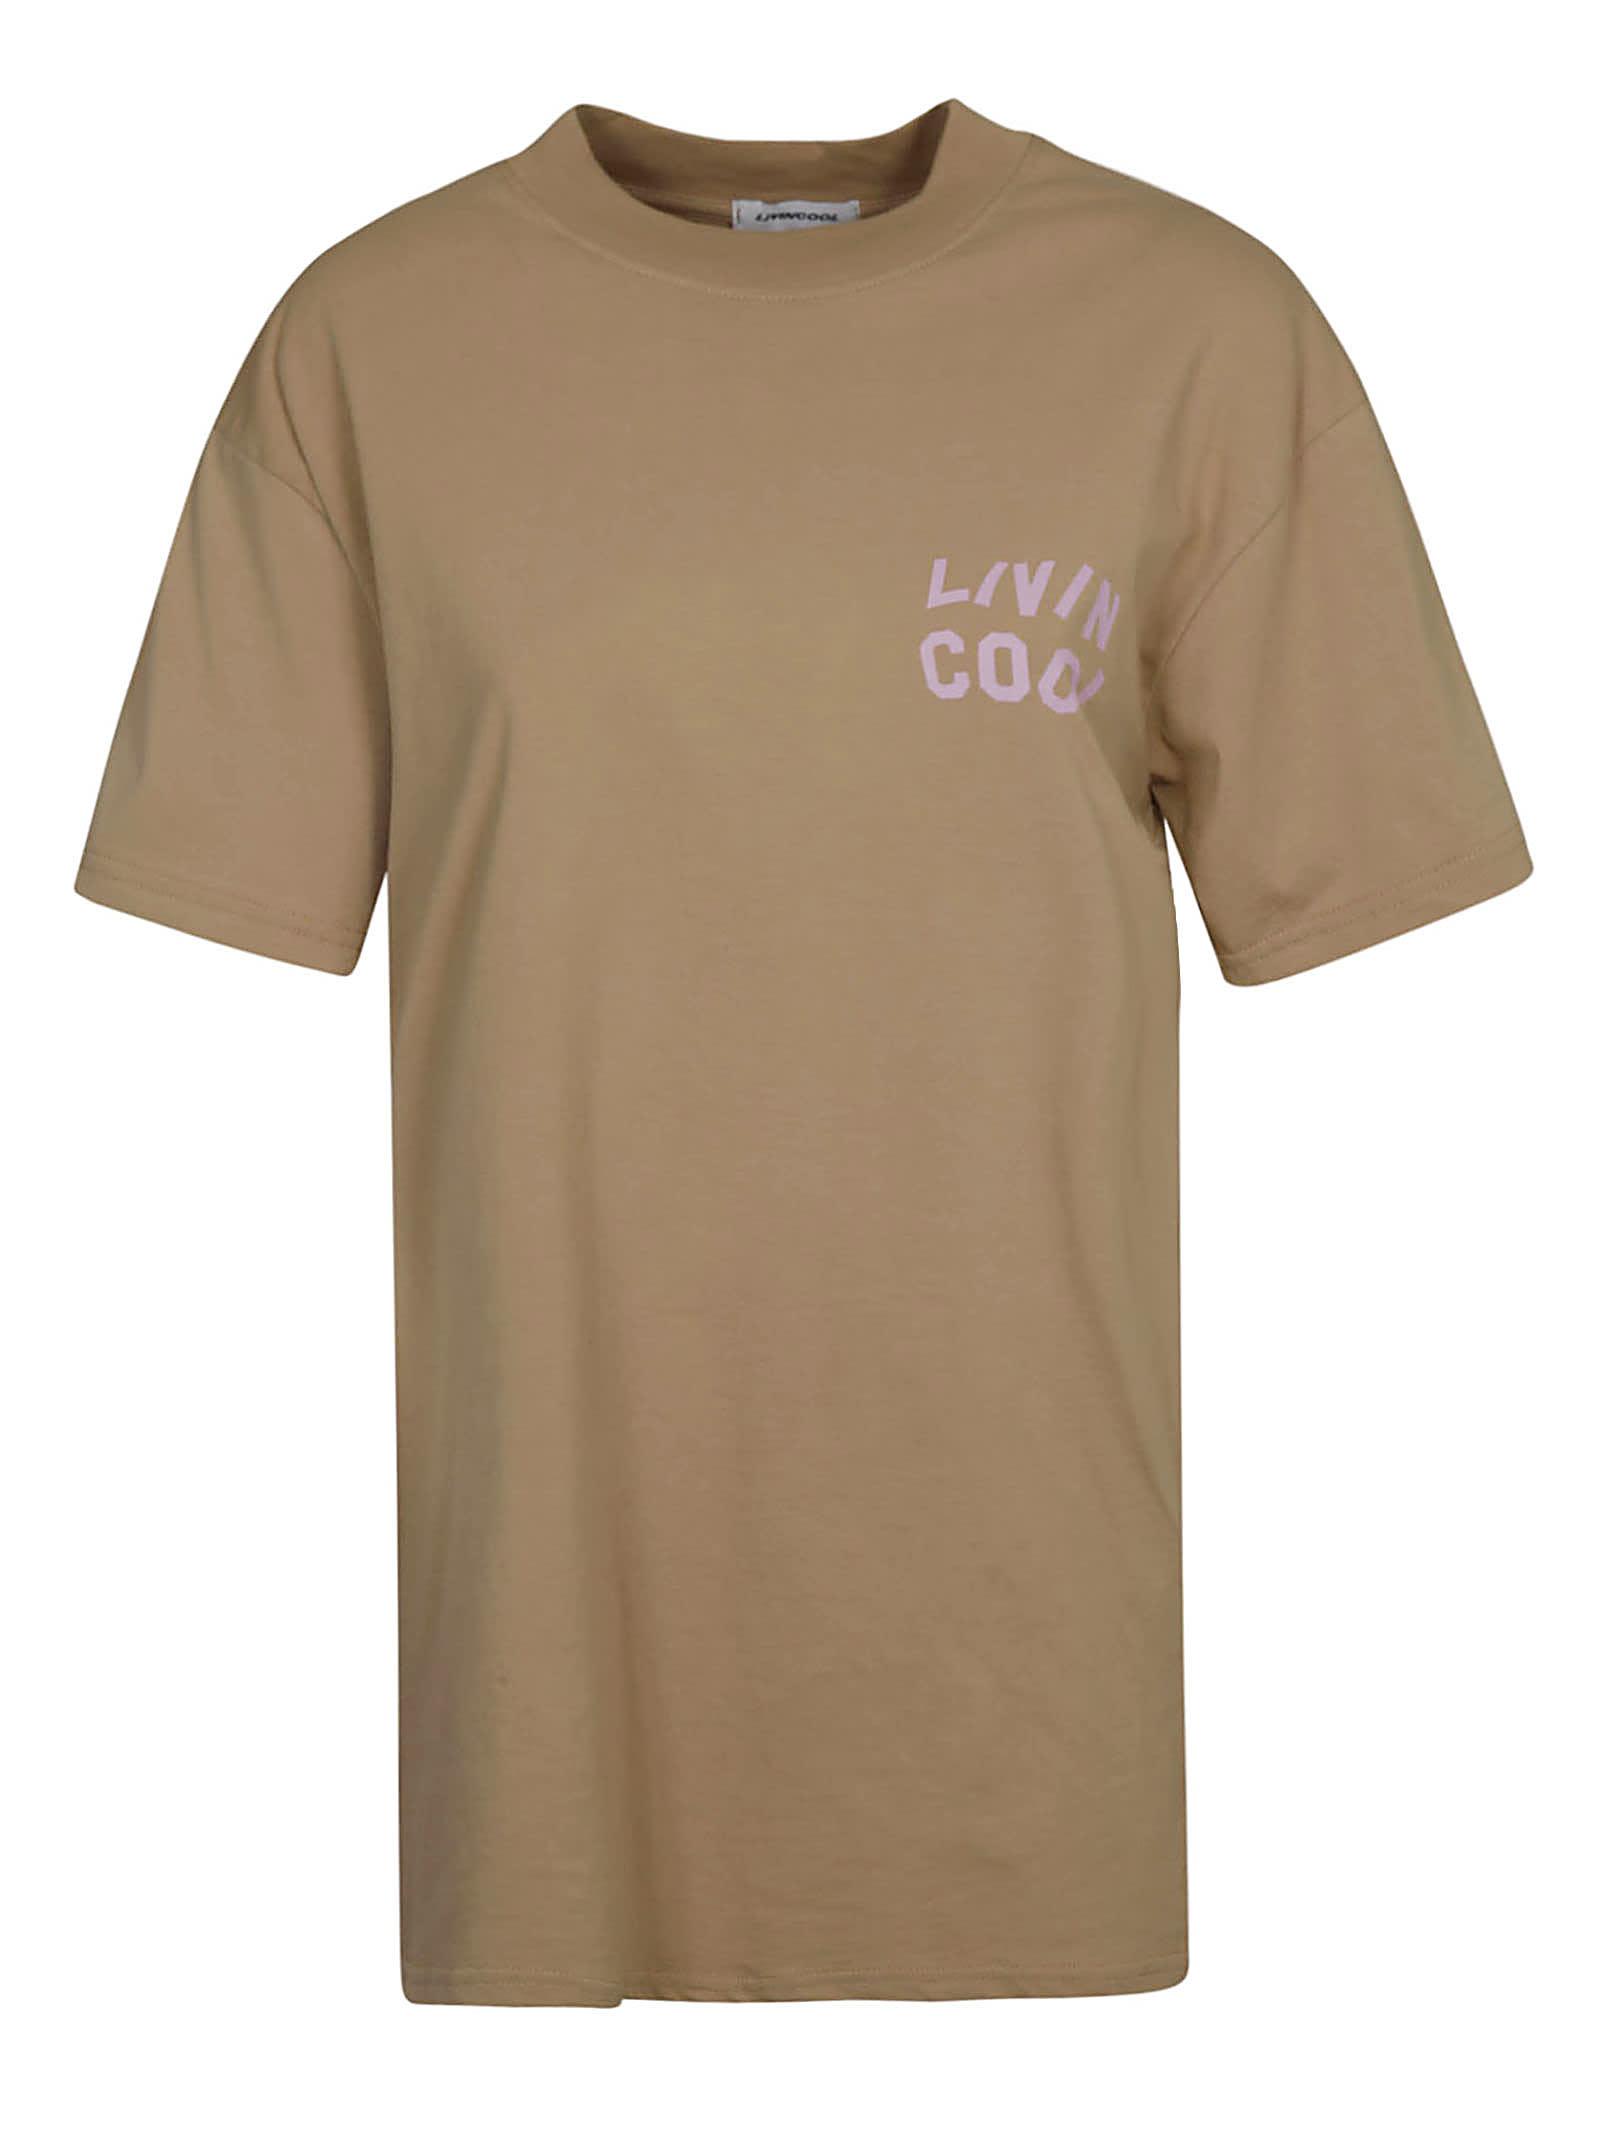 Artwork Pigment Dyed T-shirt